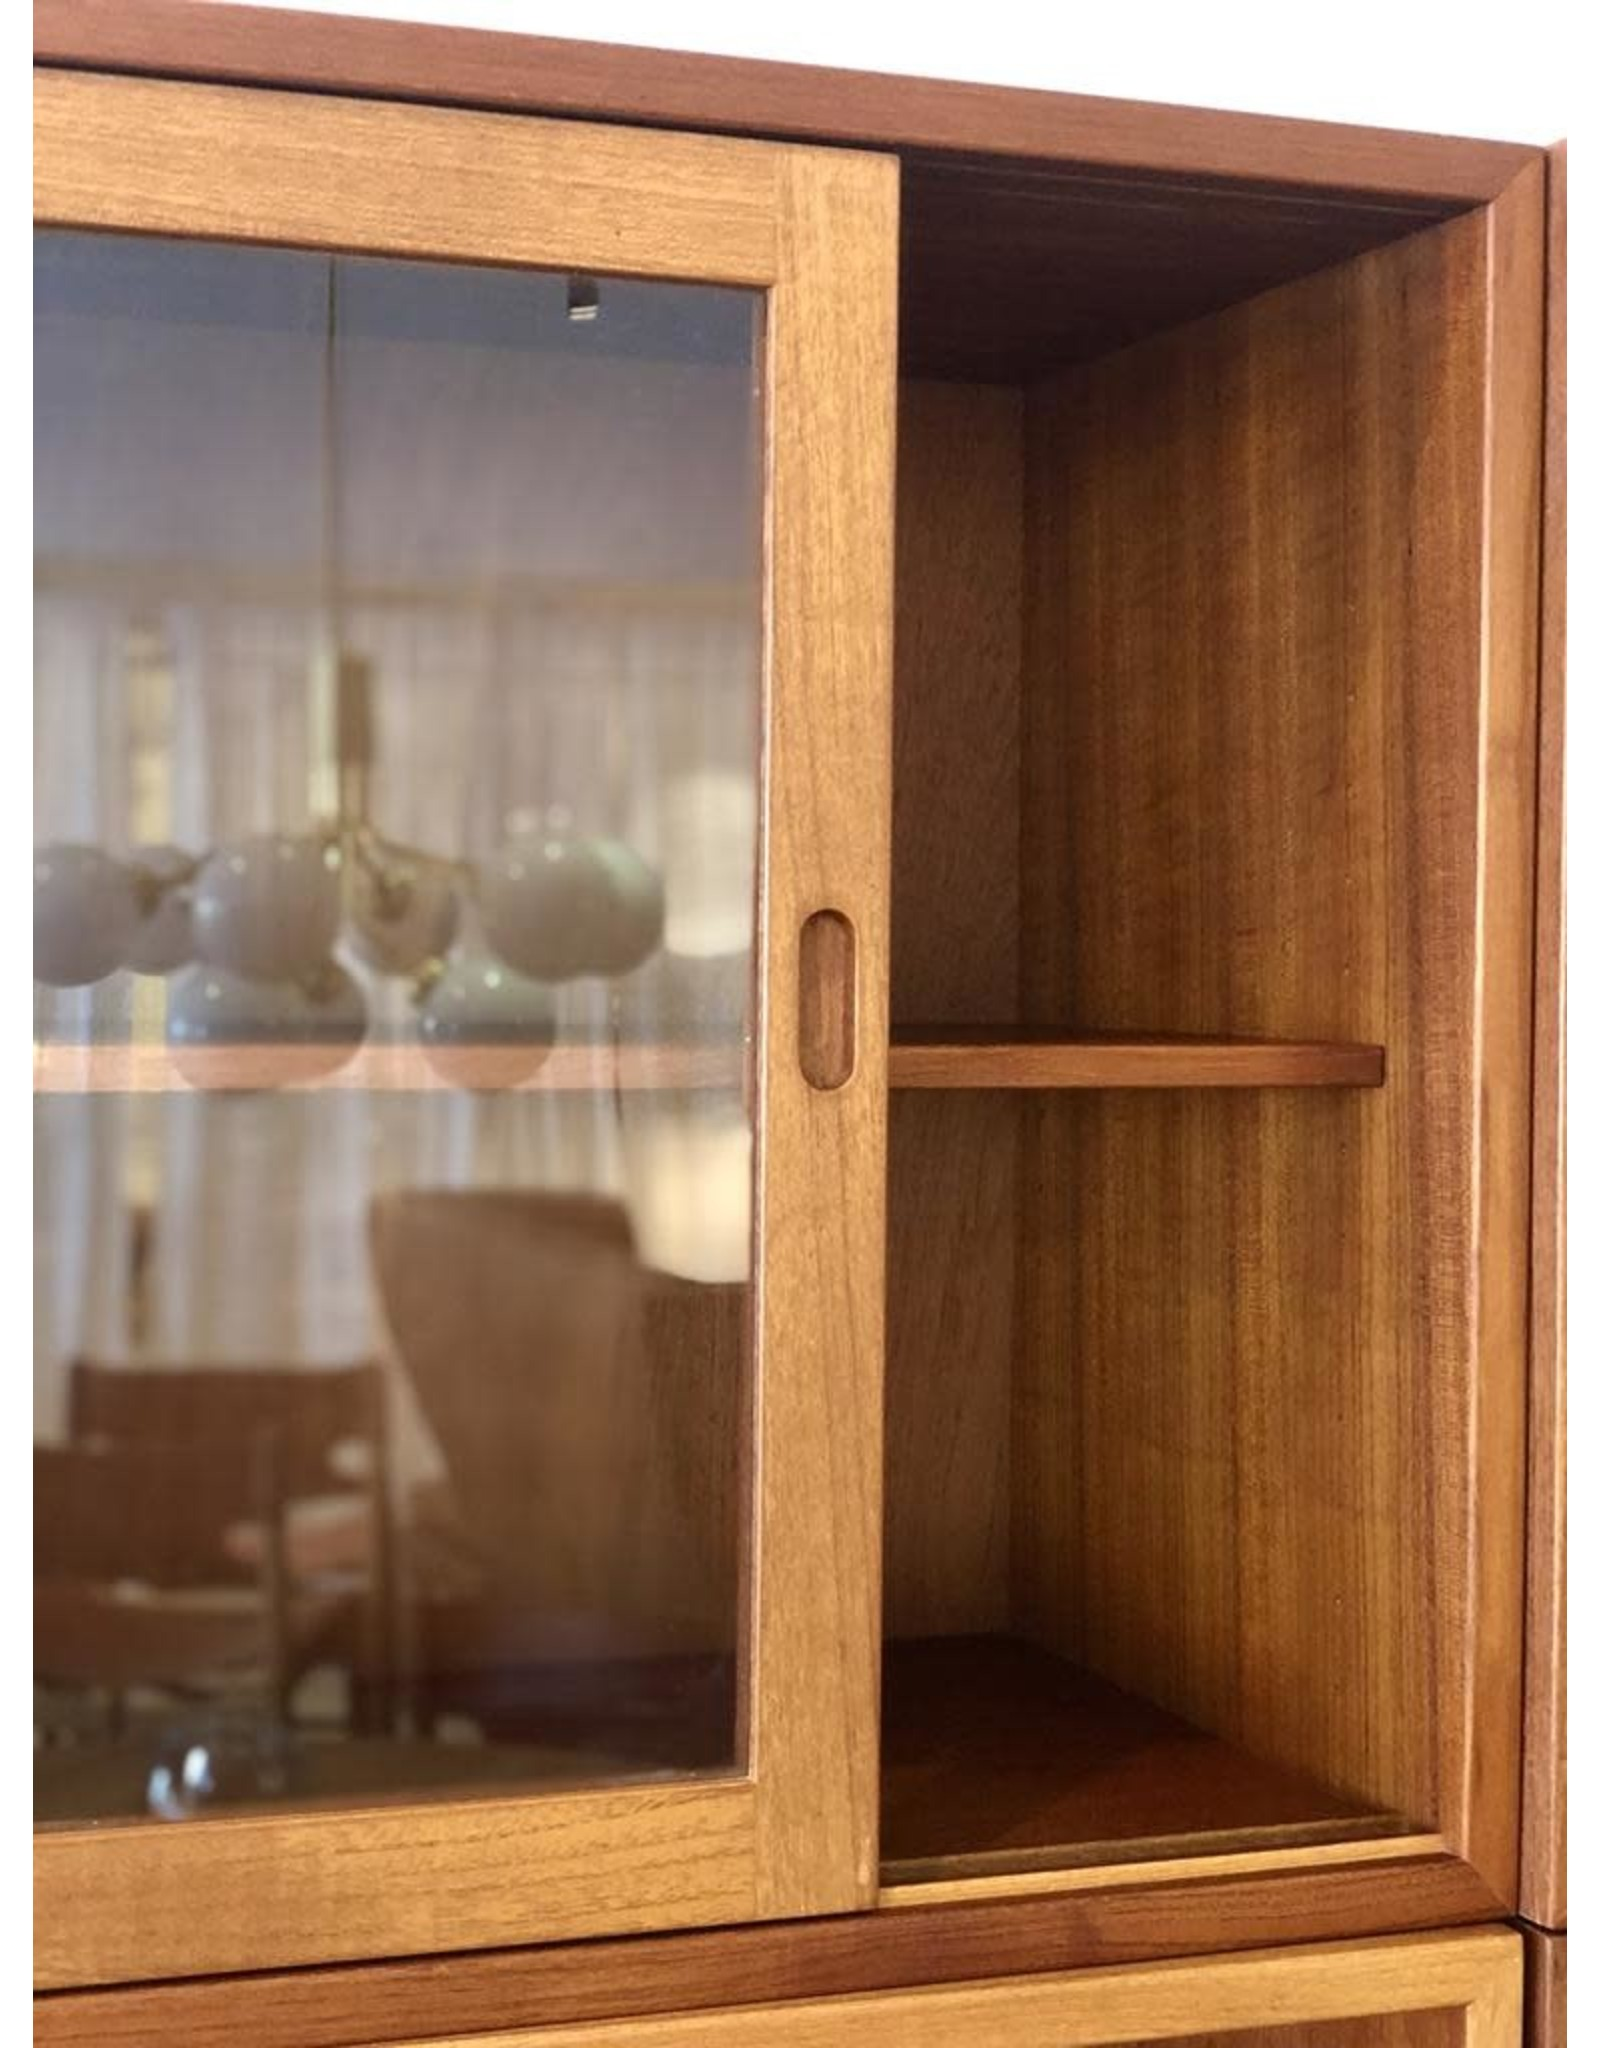 MANKS ANTIQUES 1950's ORESUND TEAK CABINET WITH SLIDING DOORS